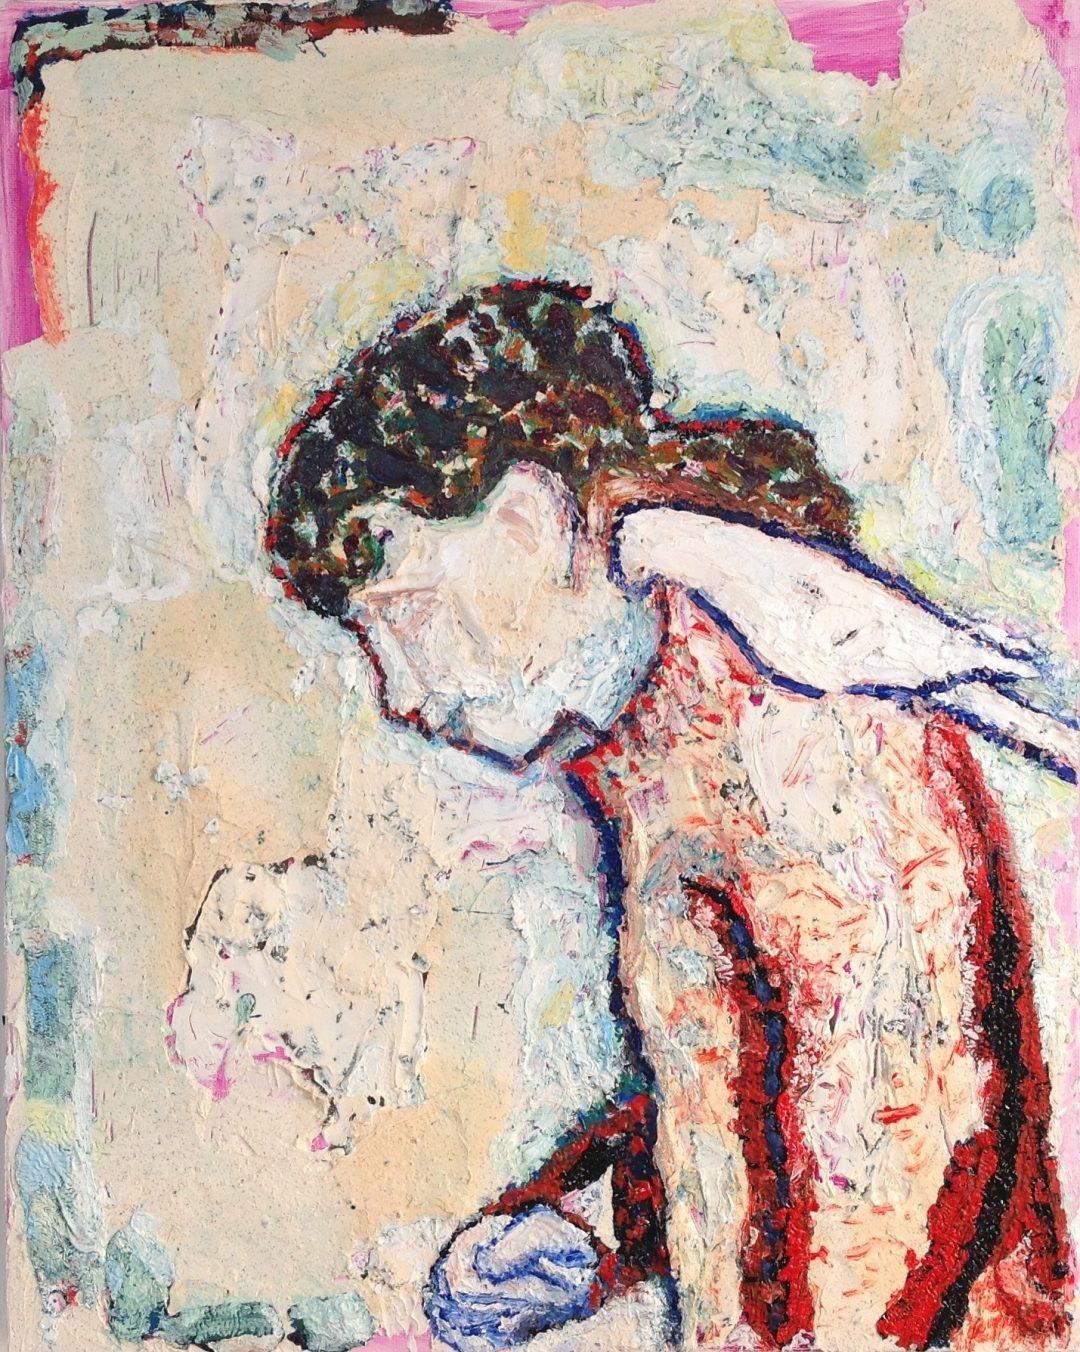 'Girl with Cockatiel' Anna Hansford Oil on canvas, 51 x 41 cm